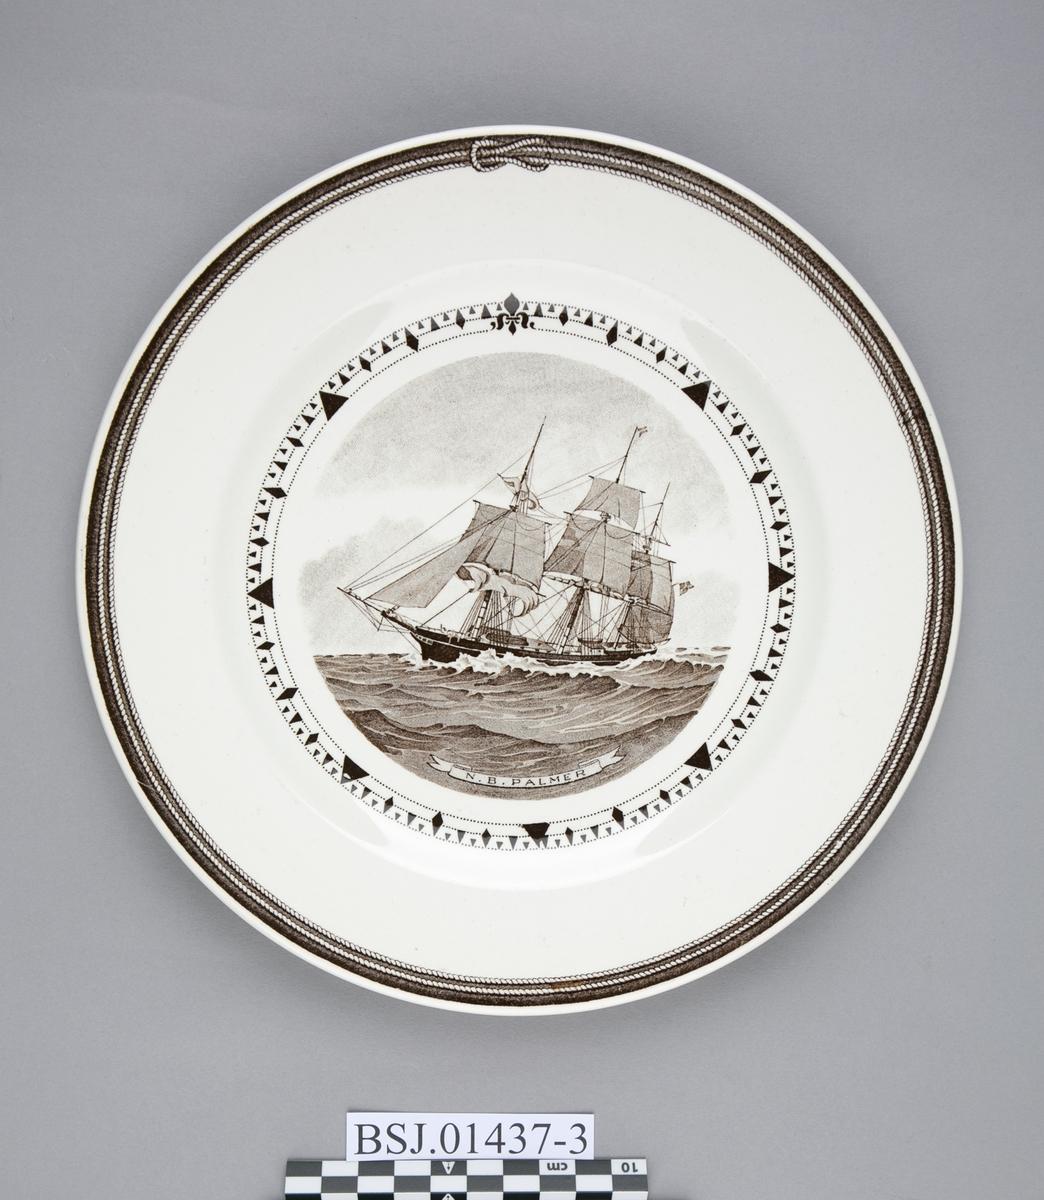 Tallerken med motiv av N. B. PALMER, amerikansk klipper skip